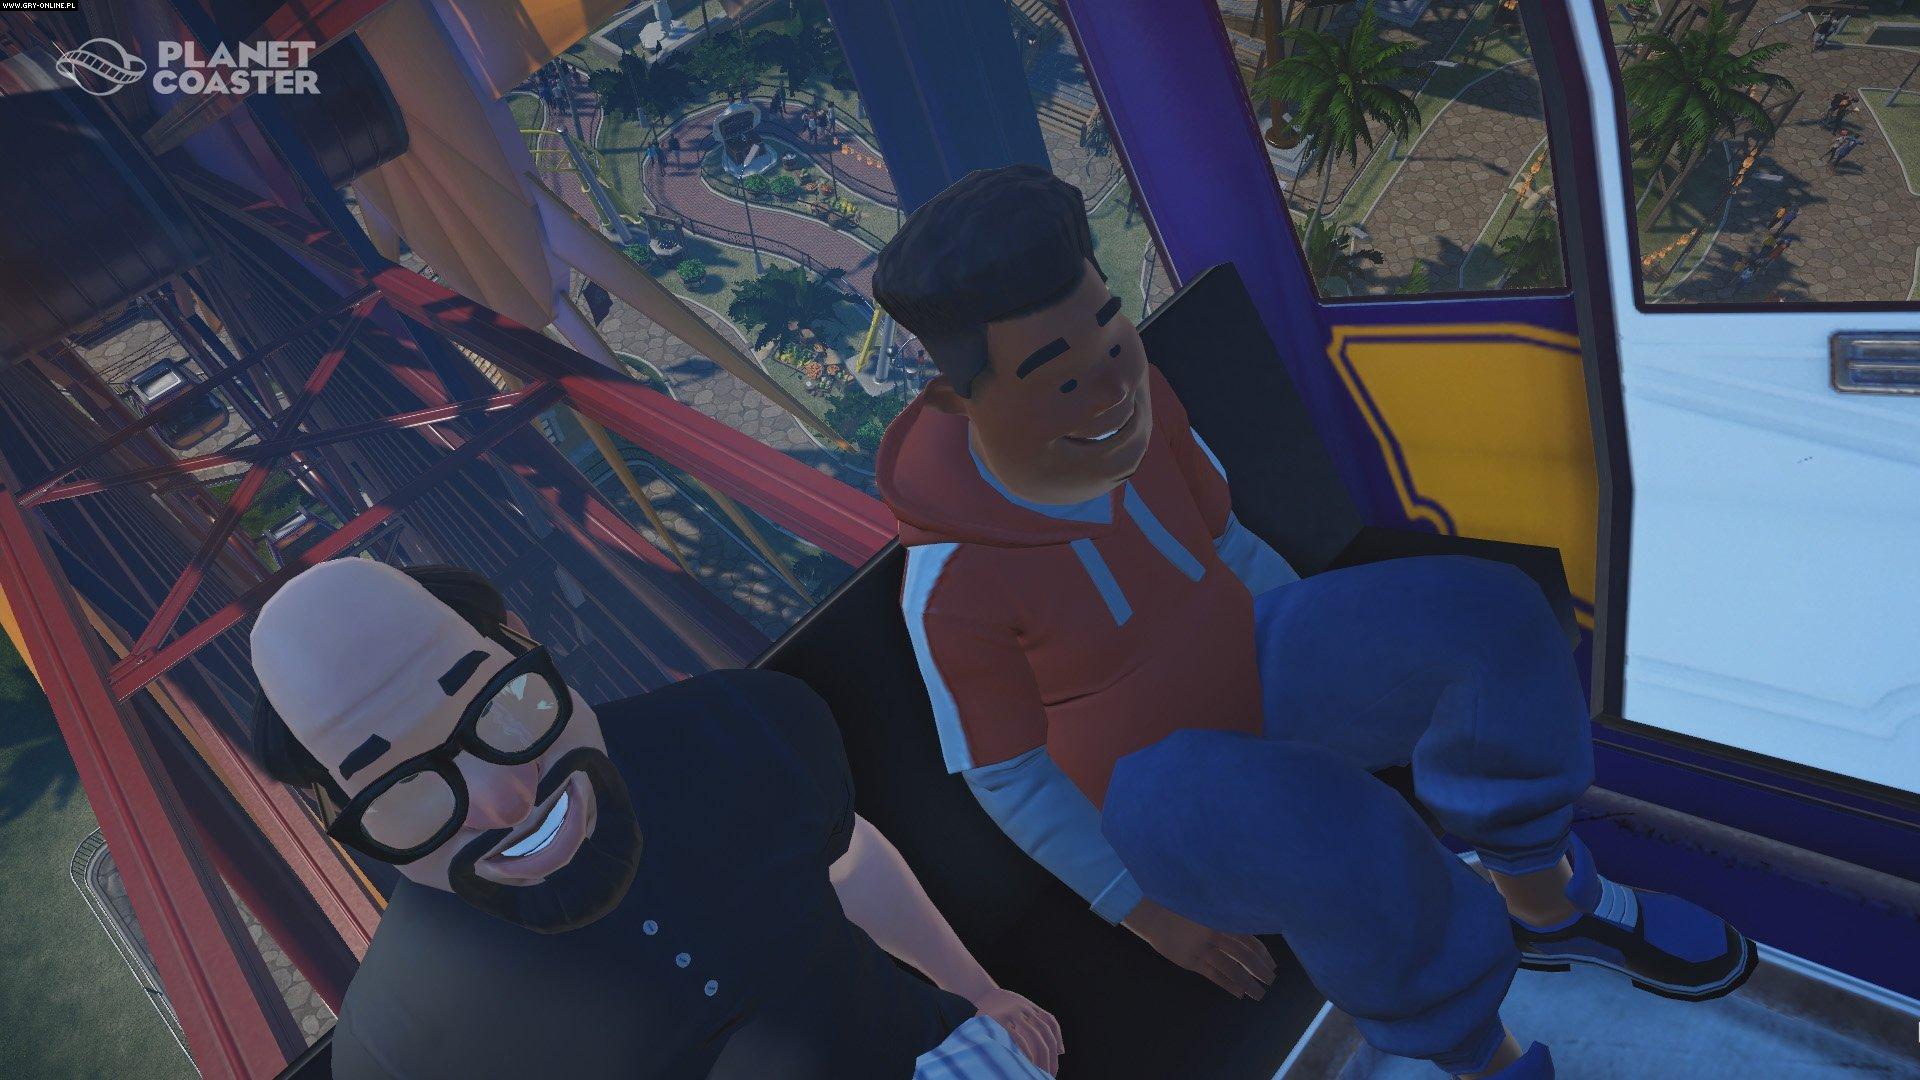 过山车之星/Planet Coaster